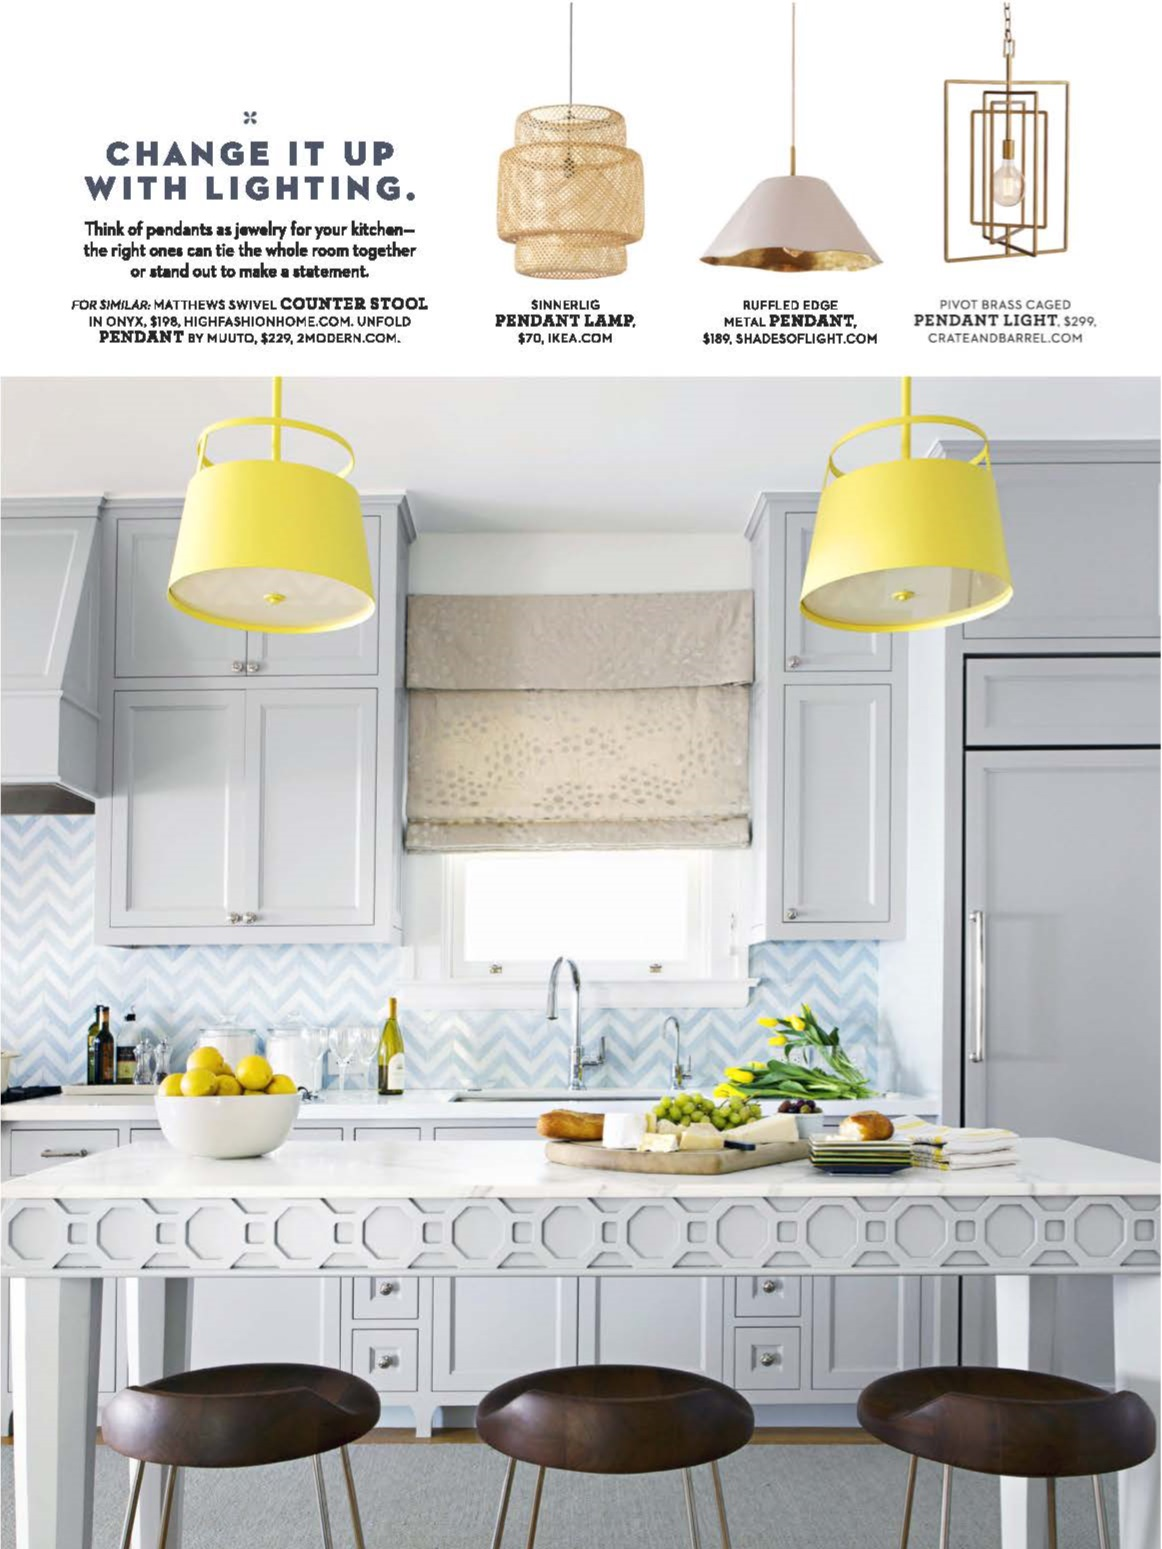 Good Housekeeping - MWM _Page_2.jpg